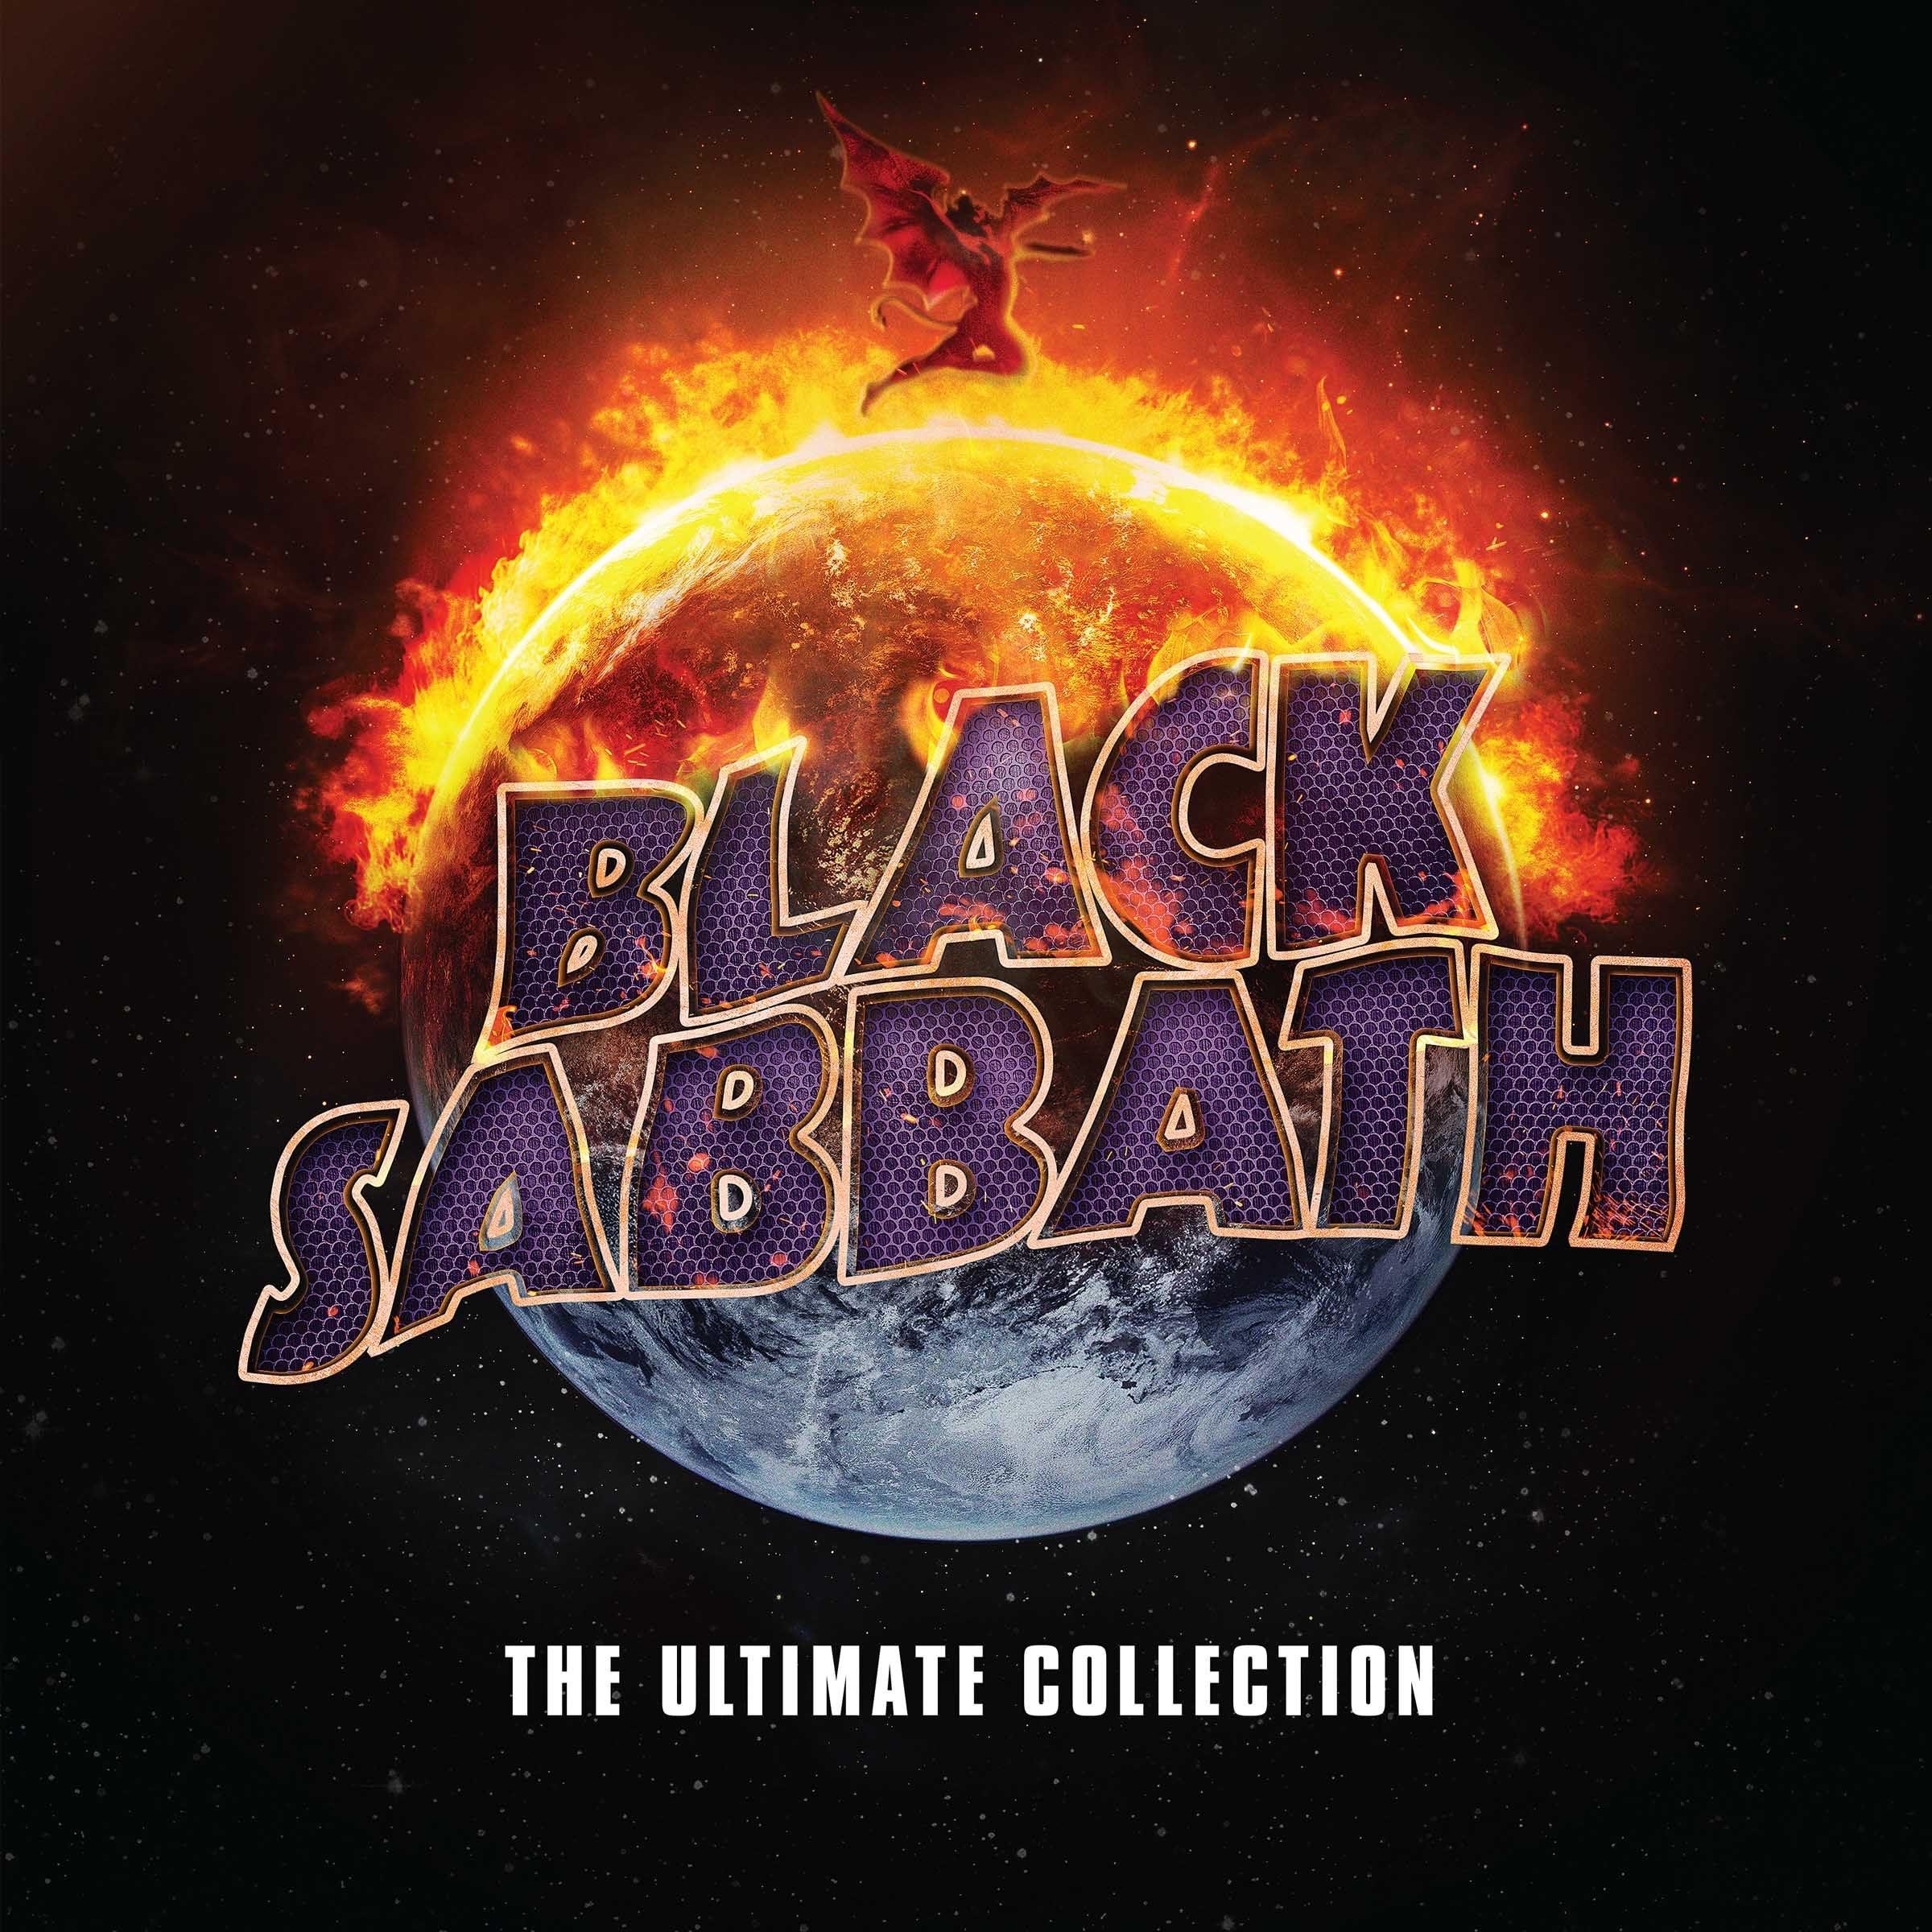 Iron Man by Black Sabbath